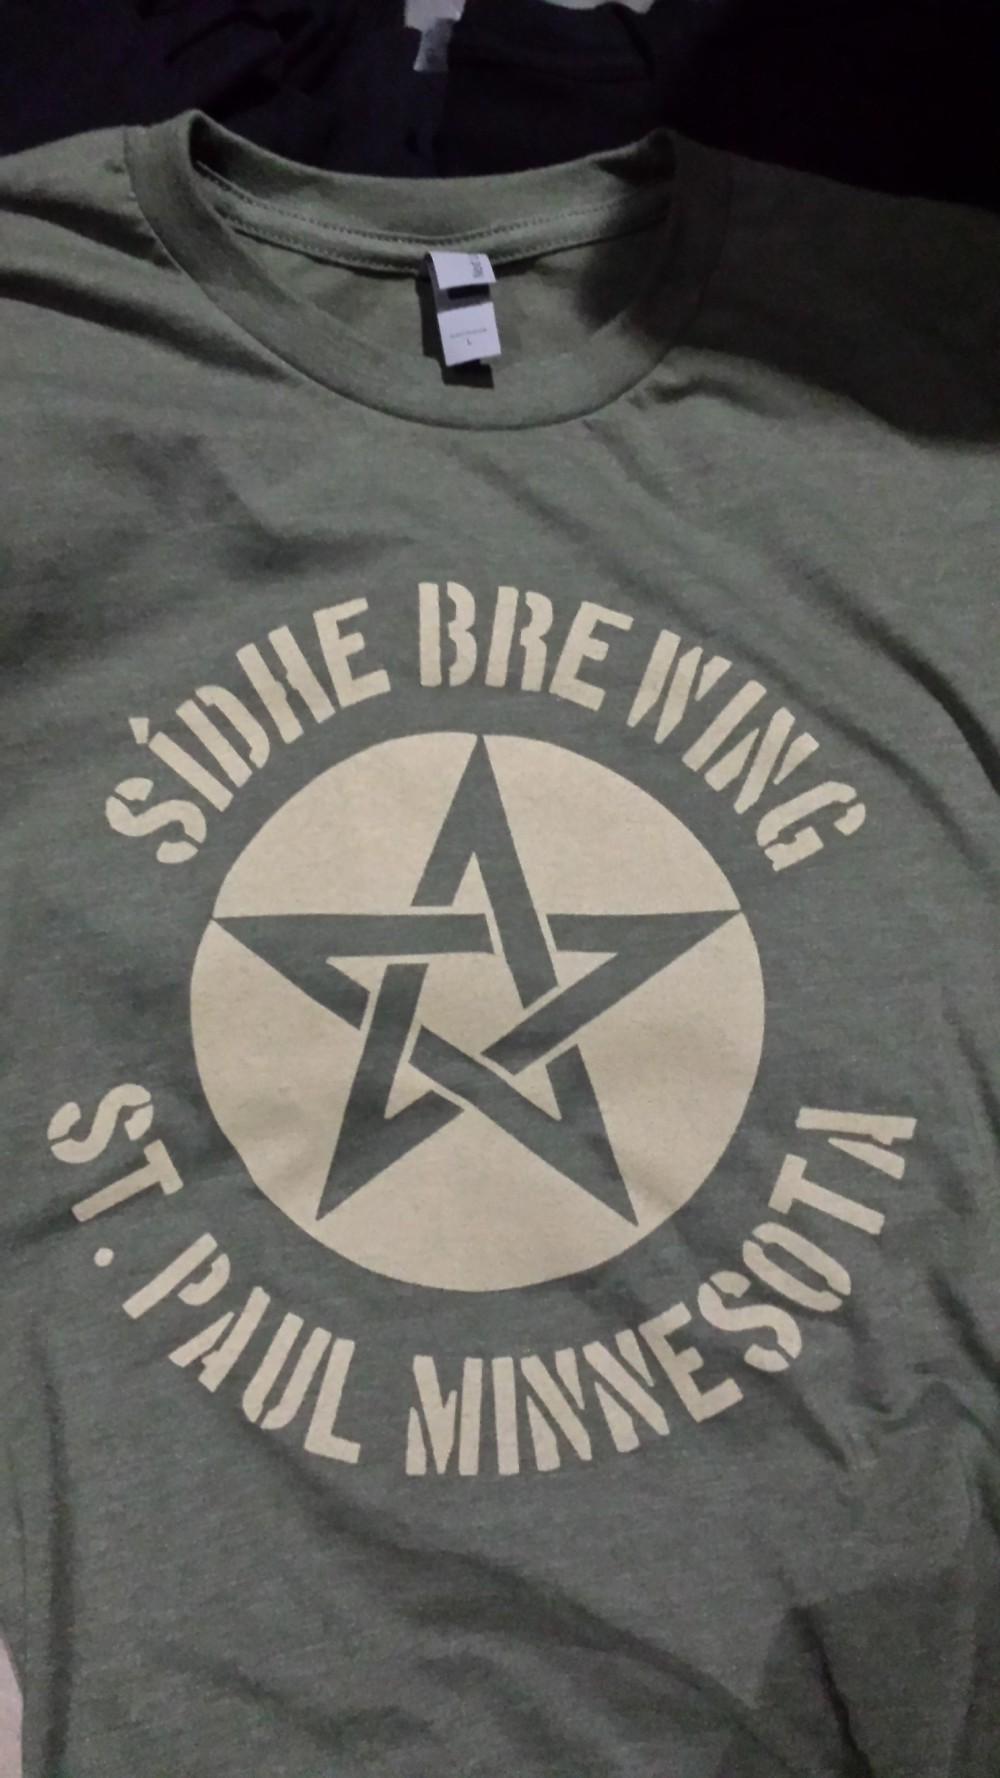 sidhe-brewing-mn-tshirt.jpg